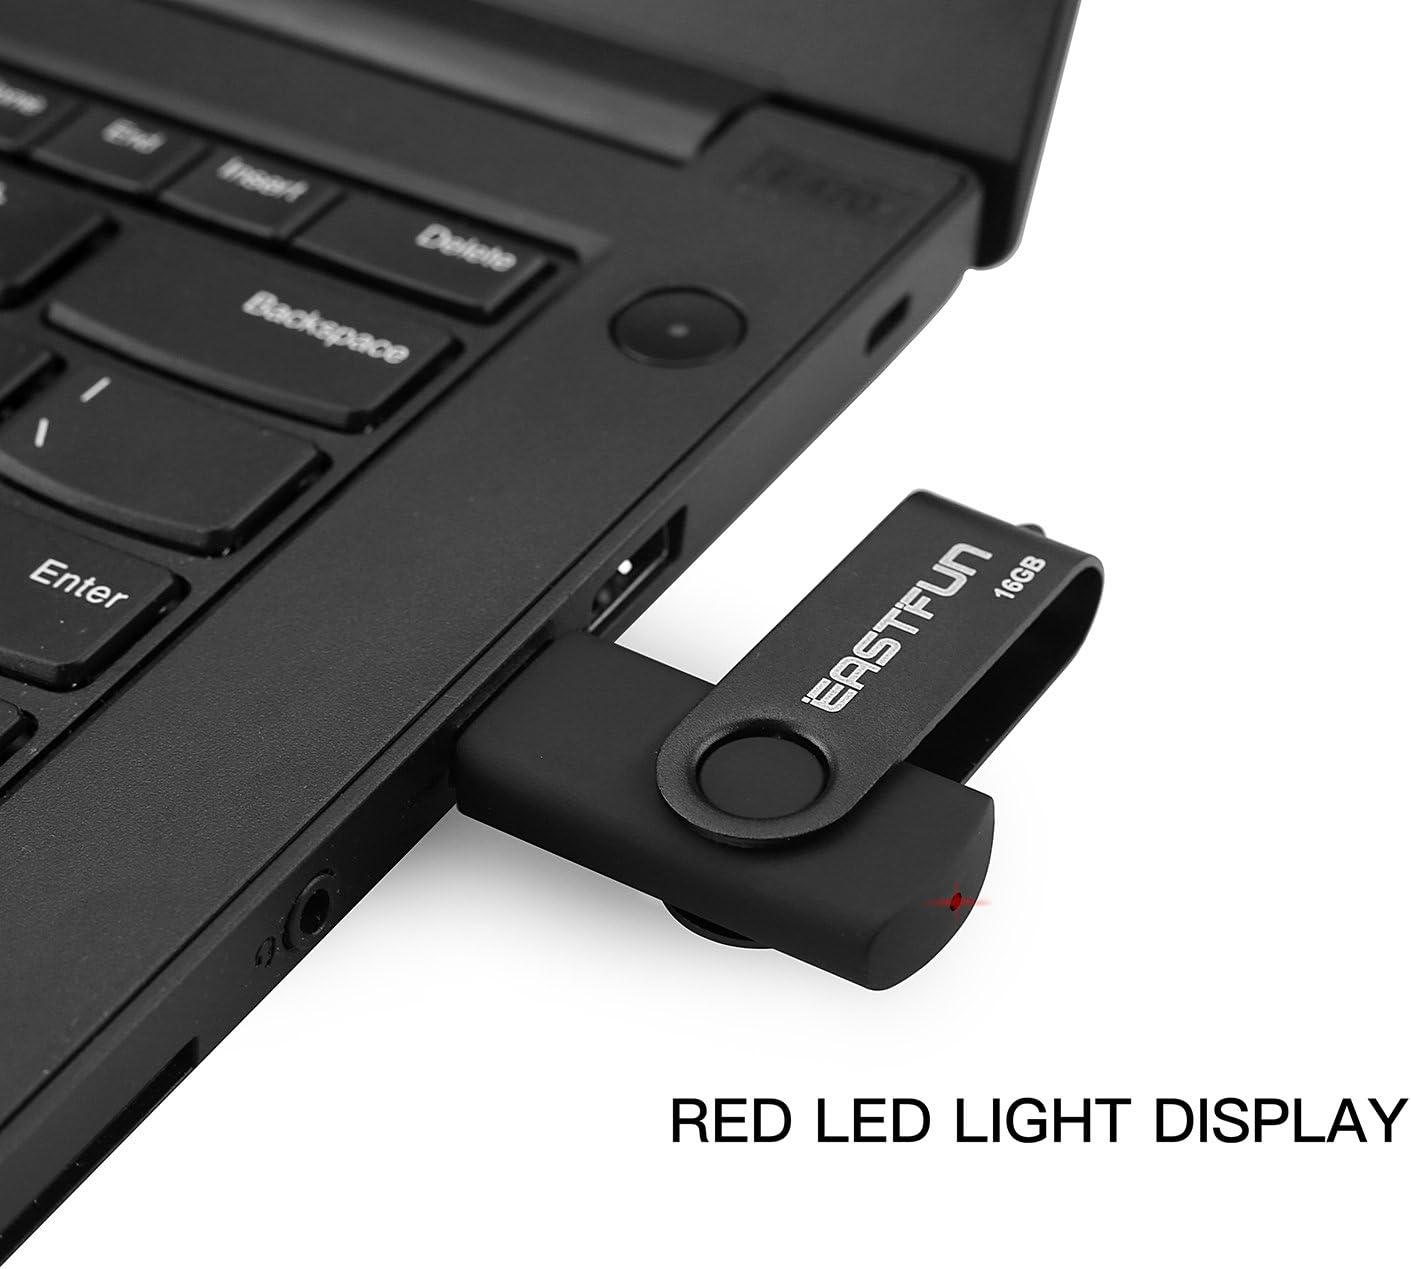 EASTFUN 3Pack 16GB USB 2.0 Flash Drive Thumb Drive Jump Drive Pen Drive Zip Drive Memory Stick (Black Blue Green)